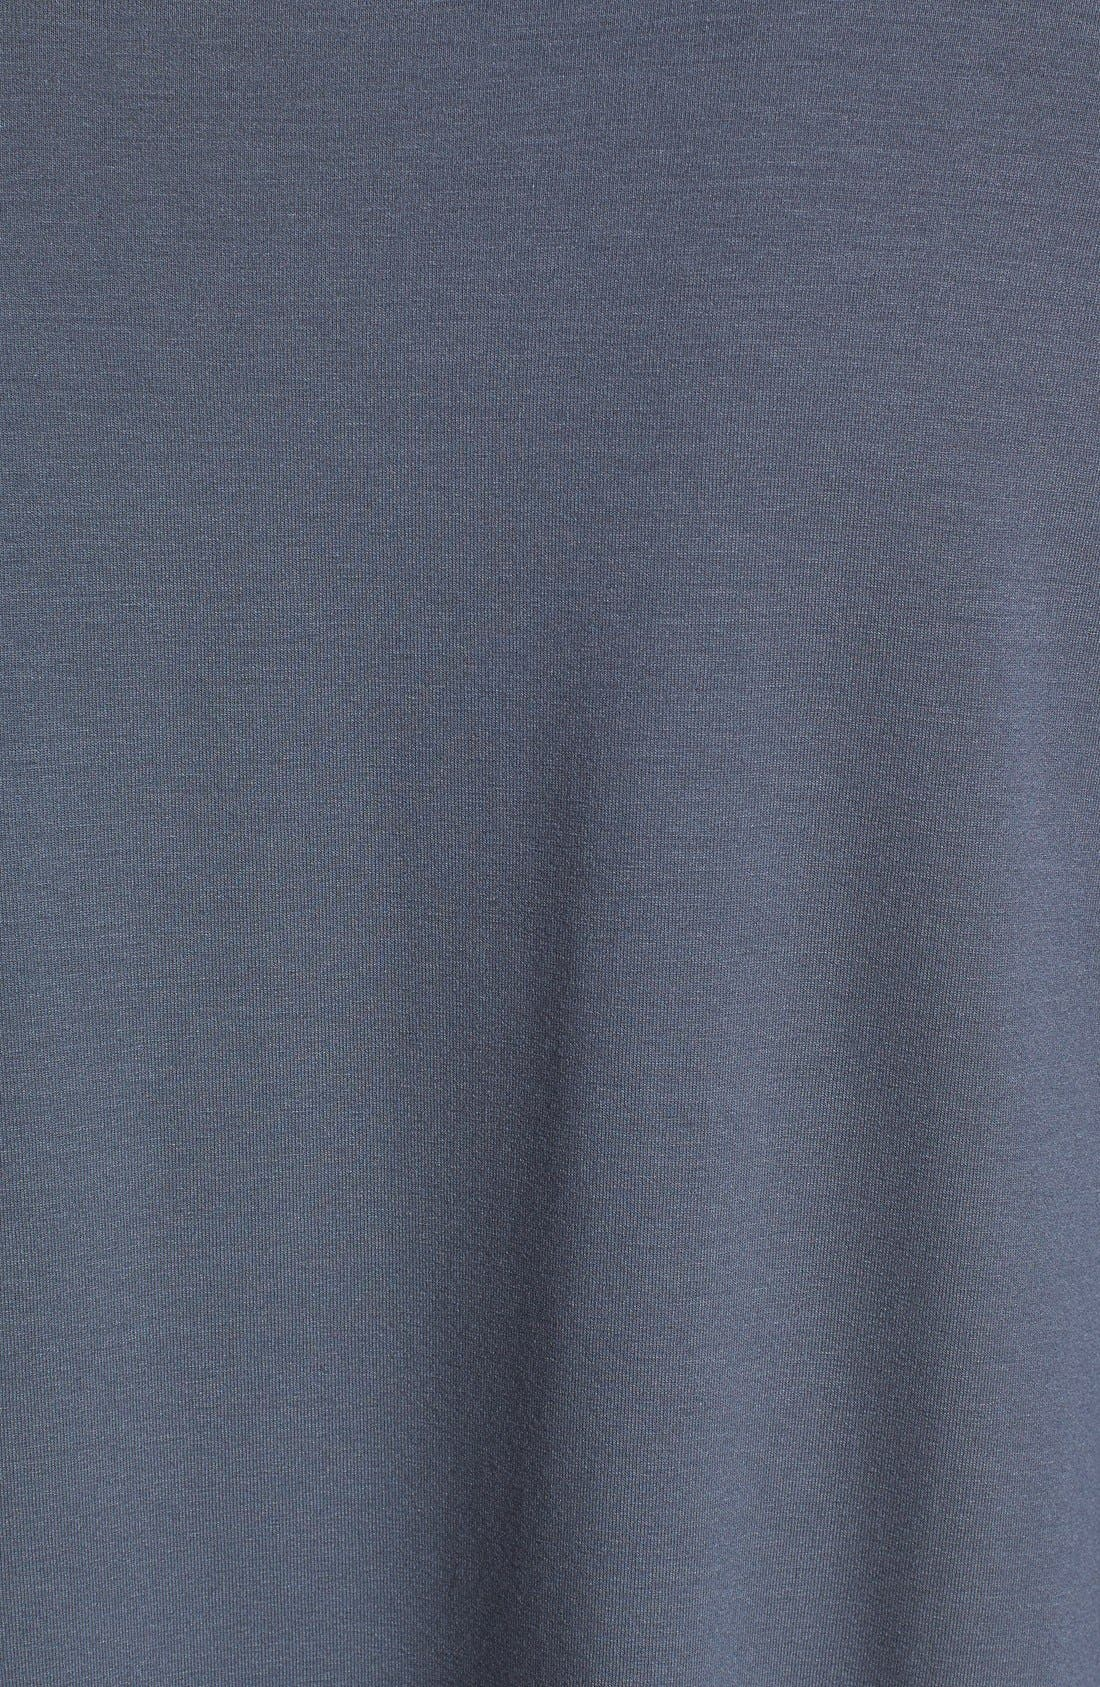 Alternate Image 3  - Eileen Fisher Ballet Neck Jersey Top